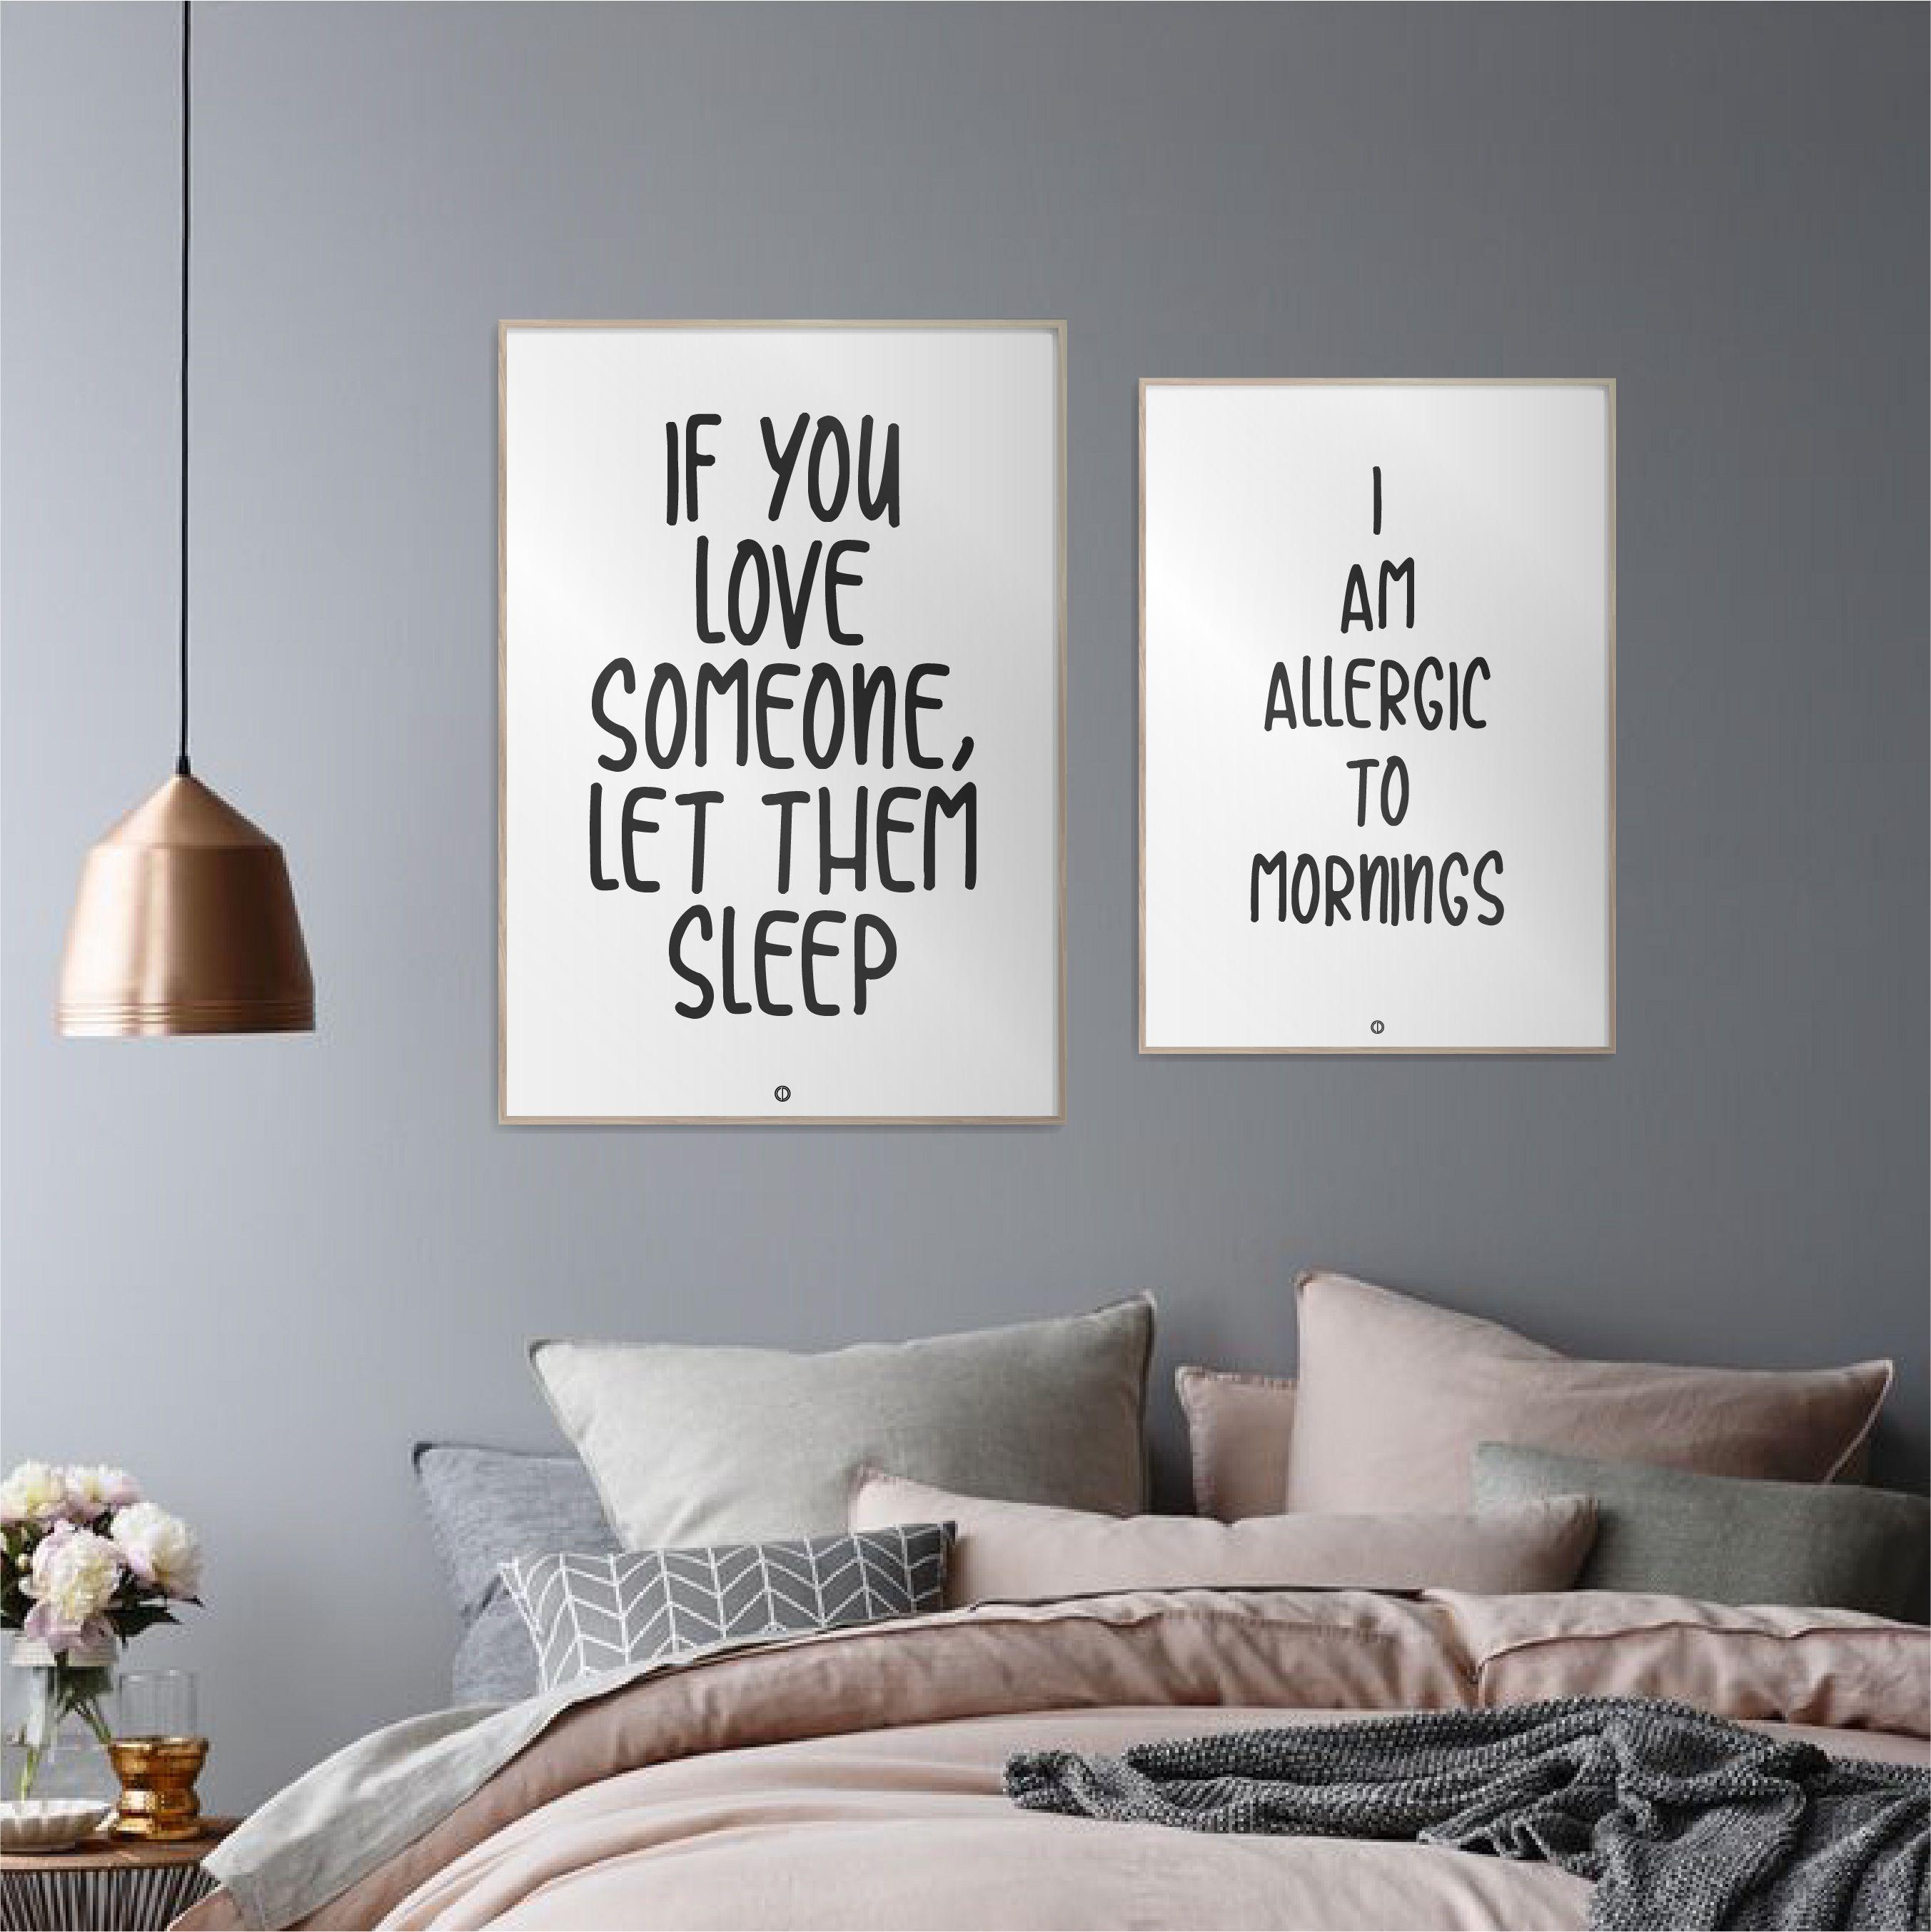 Plakater Med Tekst Personliggor Dit Hejm Med Plakater Med Sjove Tekster Plakater Sovevaerelse Tekster